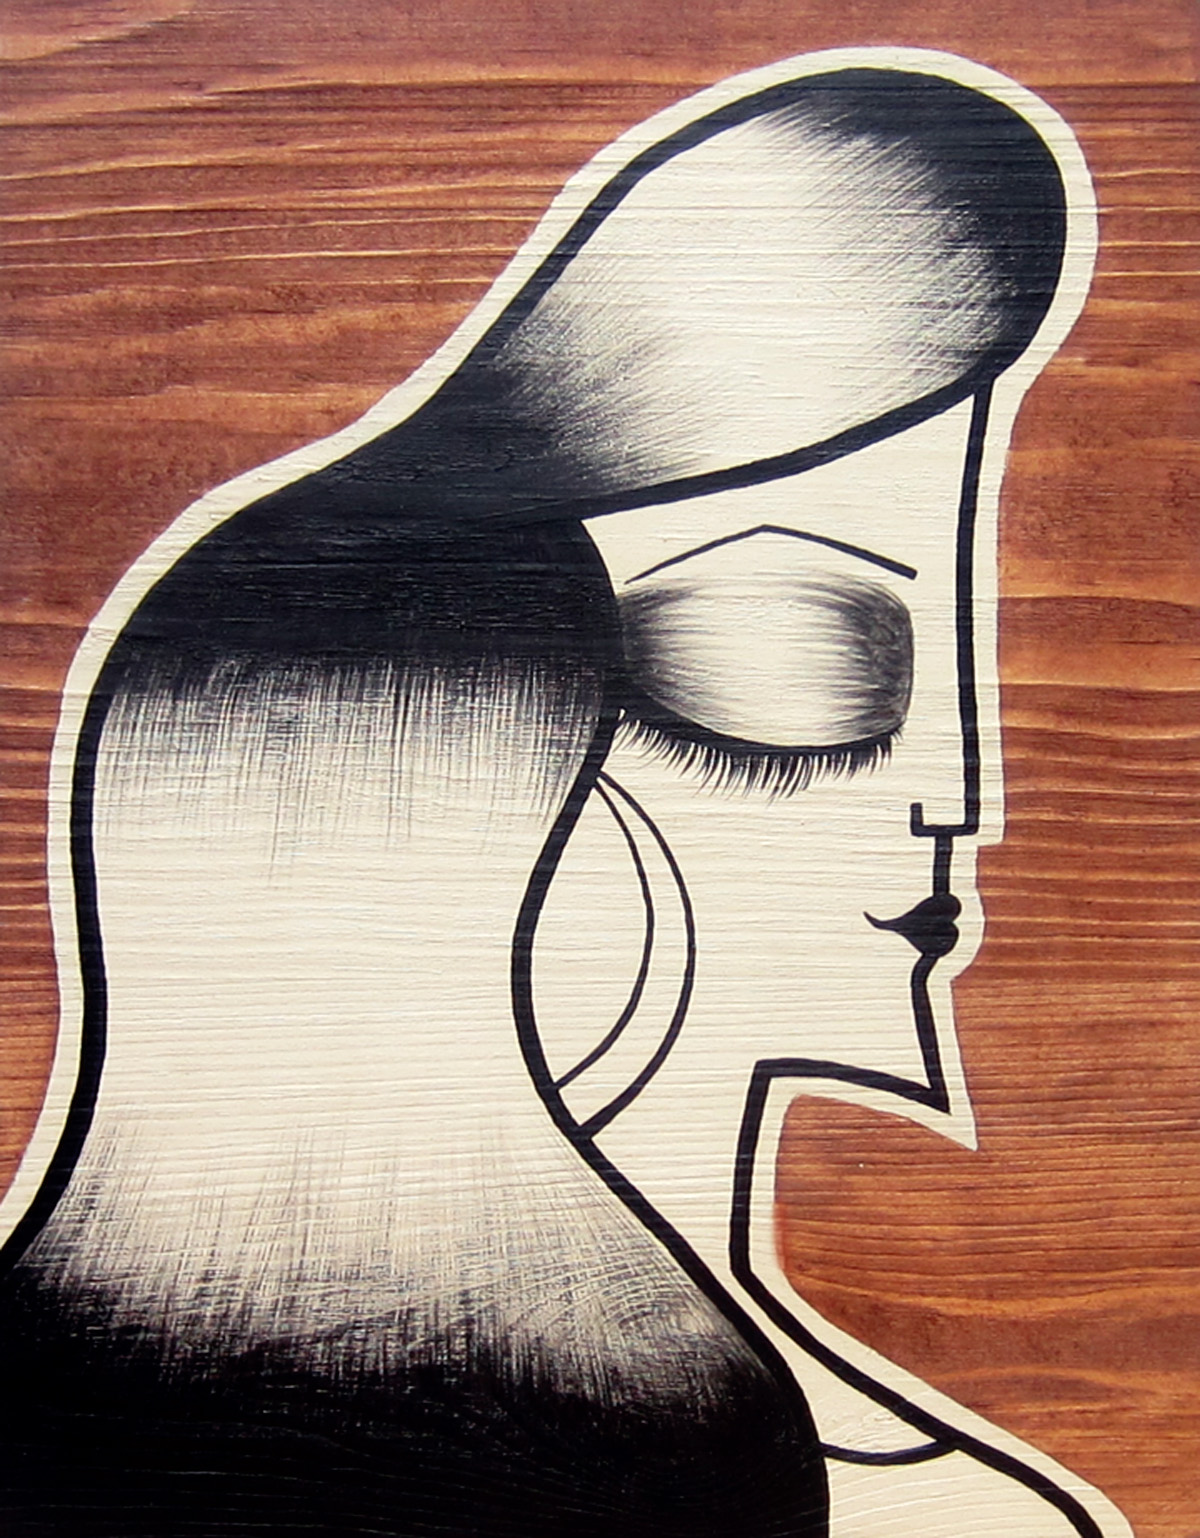 2012-04-25-pachuca_woman.jpg